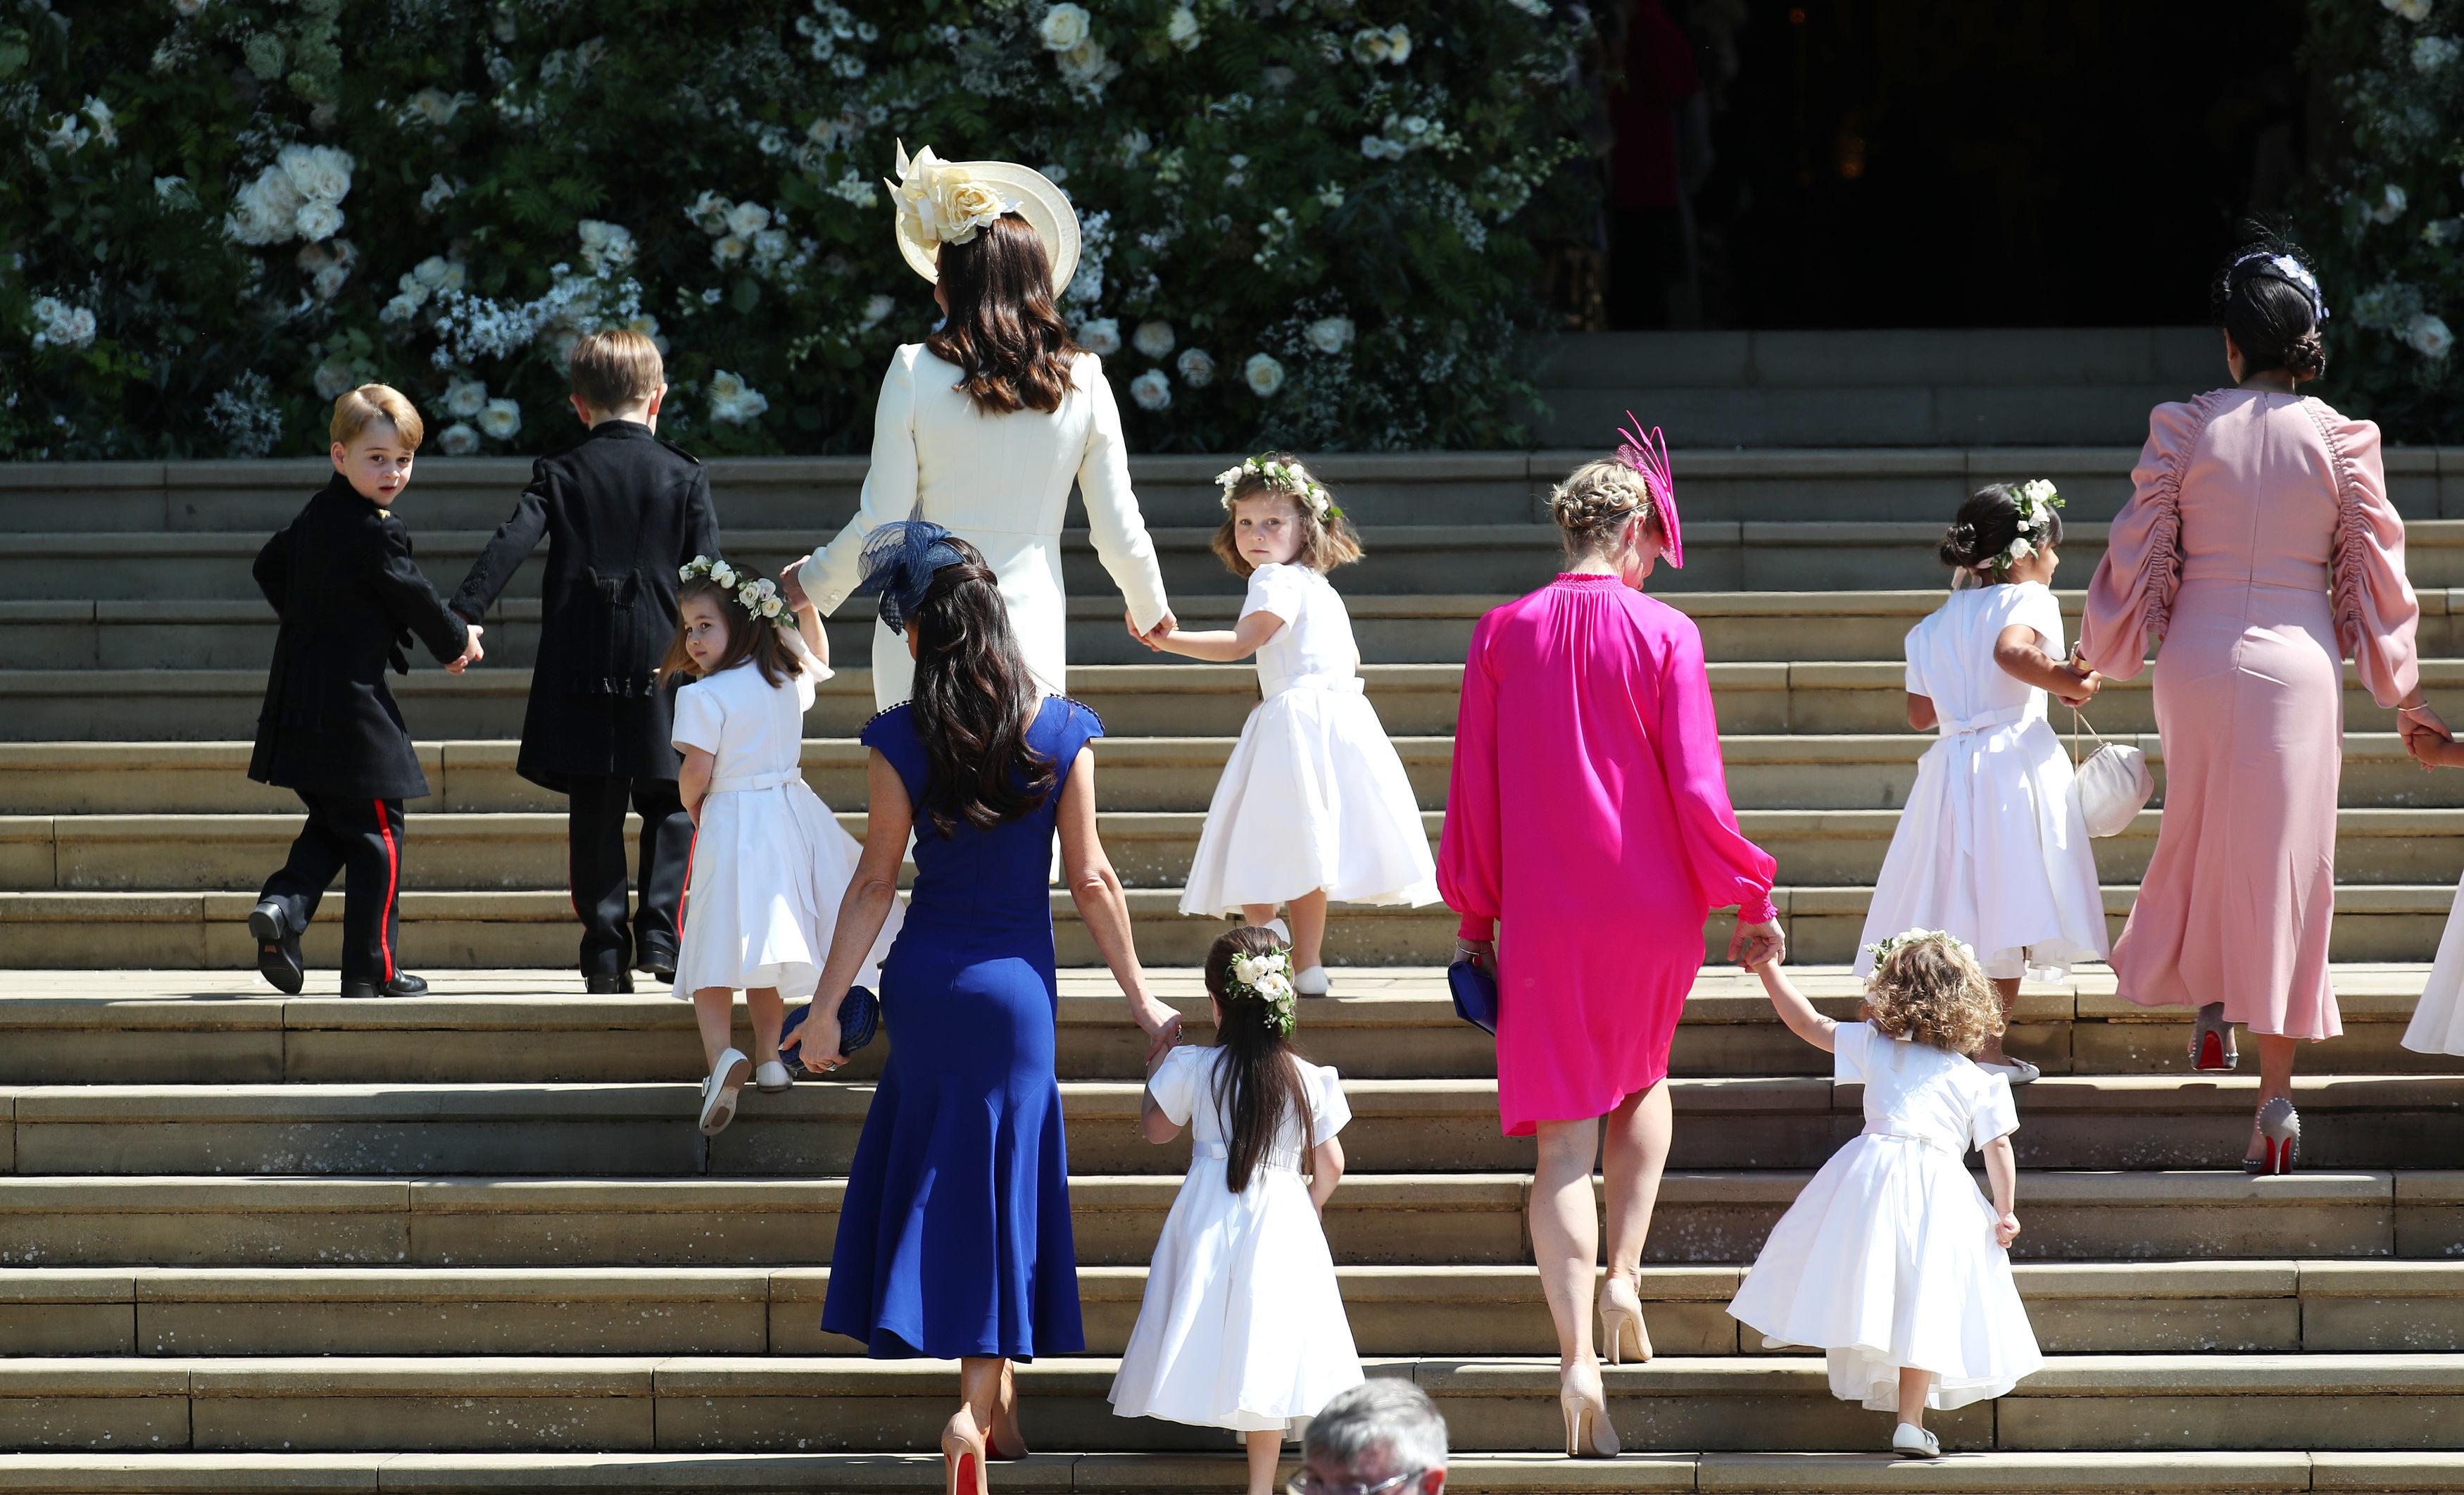 Prince George And Princess Charlotte Lead The Royal